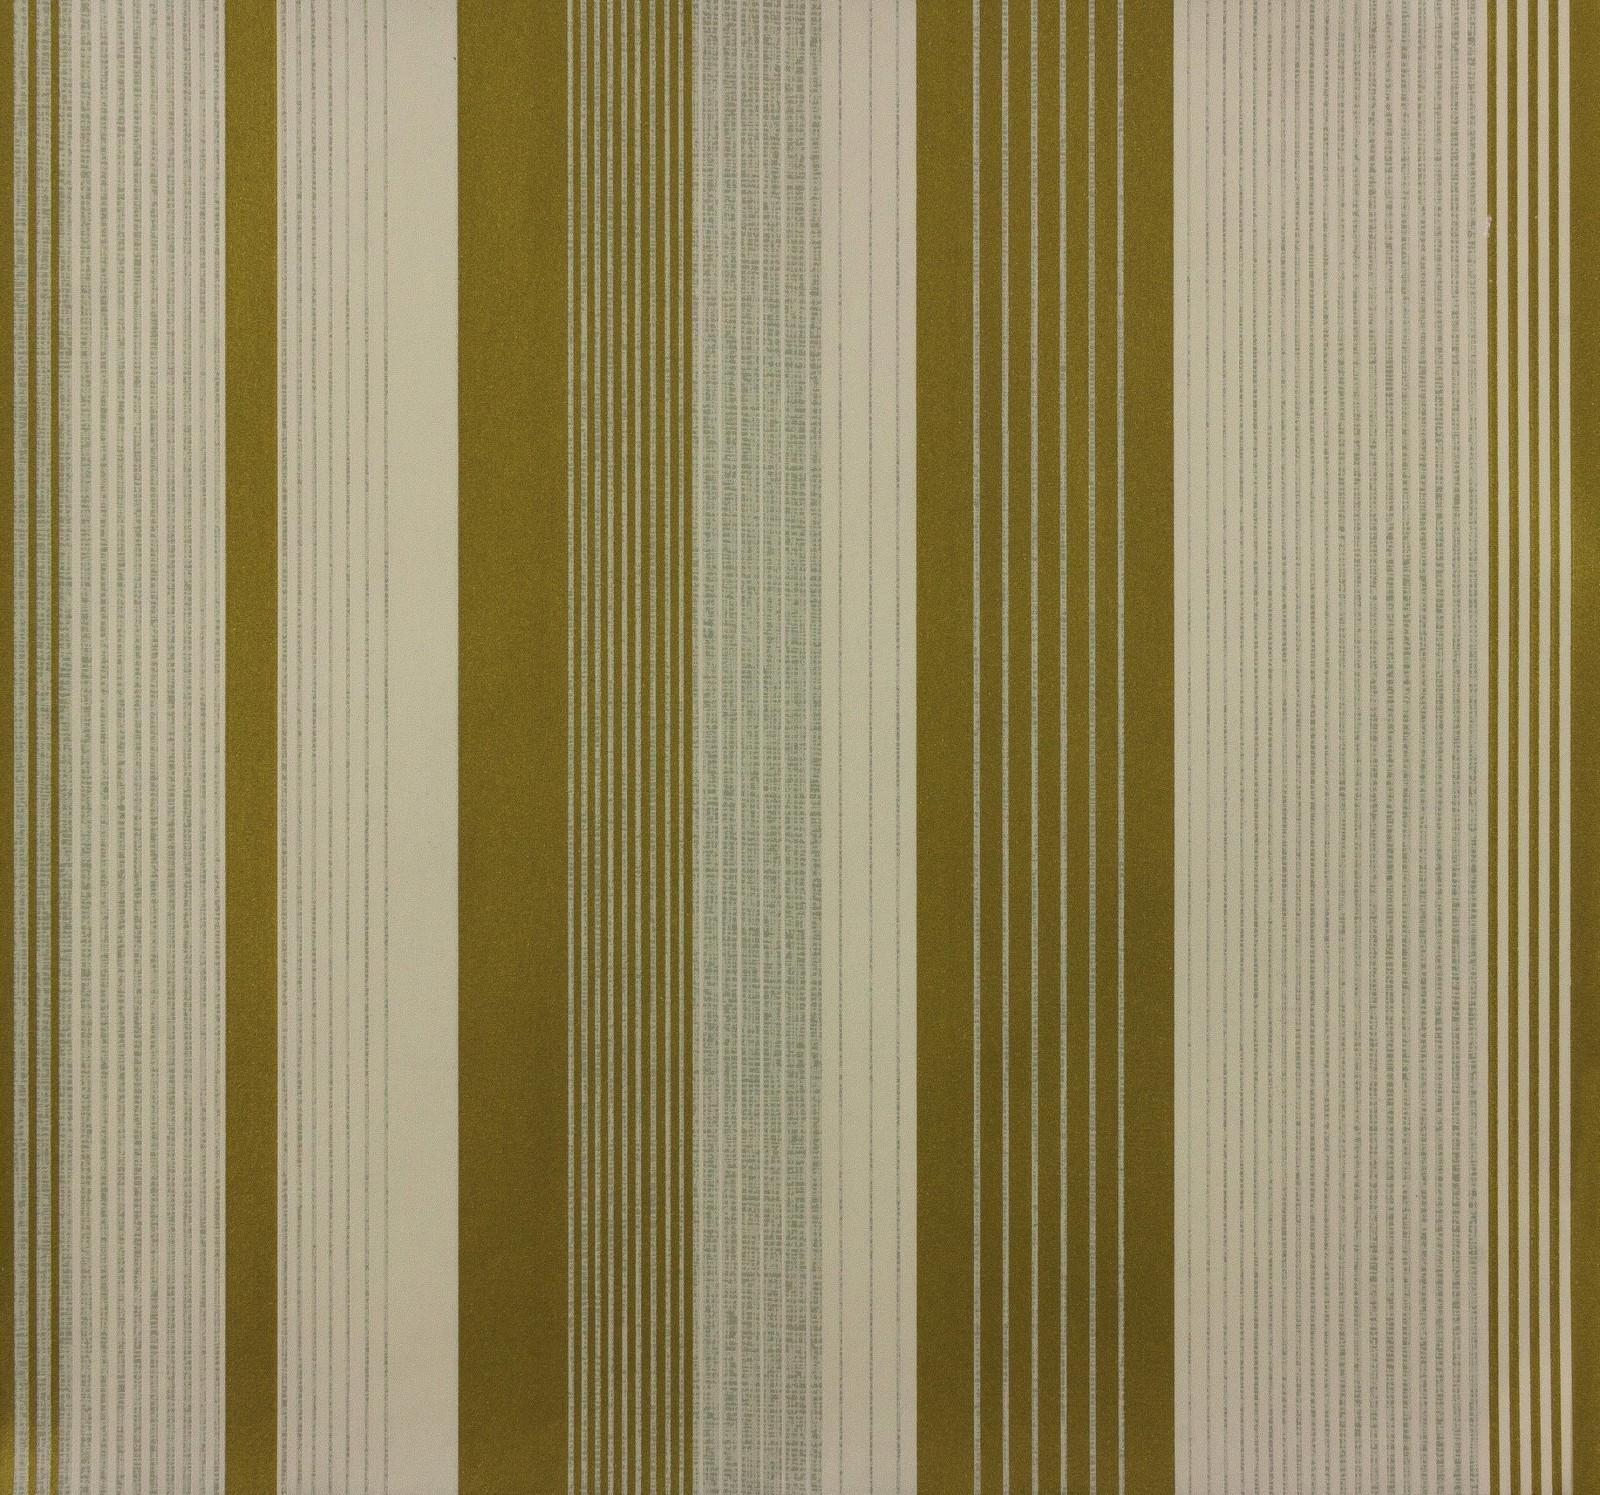 Marburg tapete astoria vliestapete 53705 streifen grau for Tapete gold grau